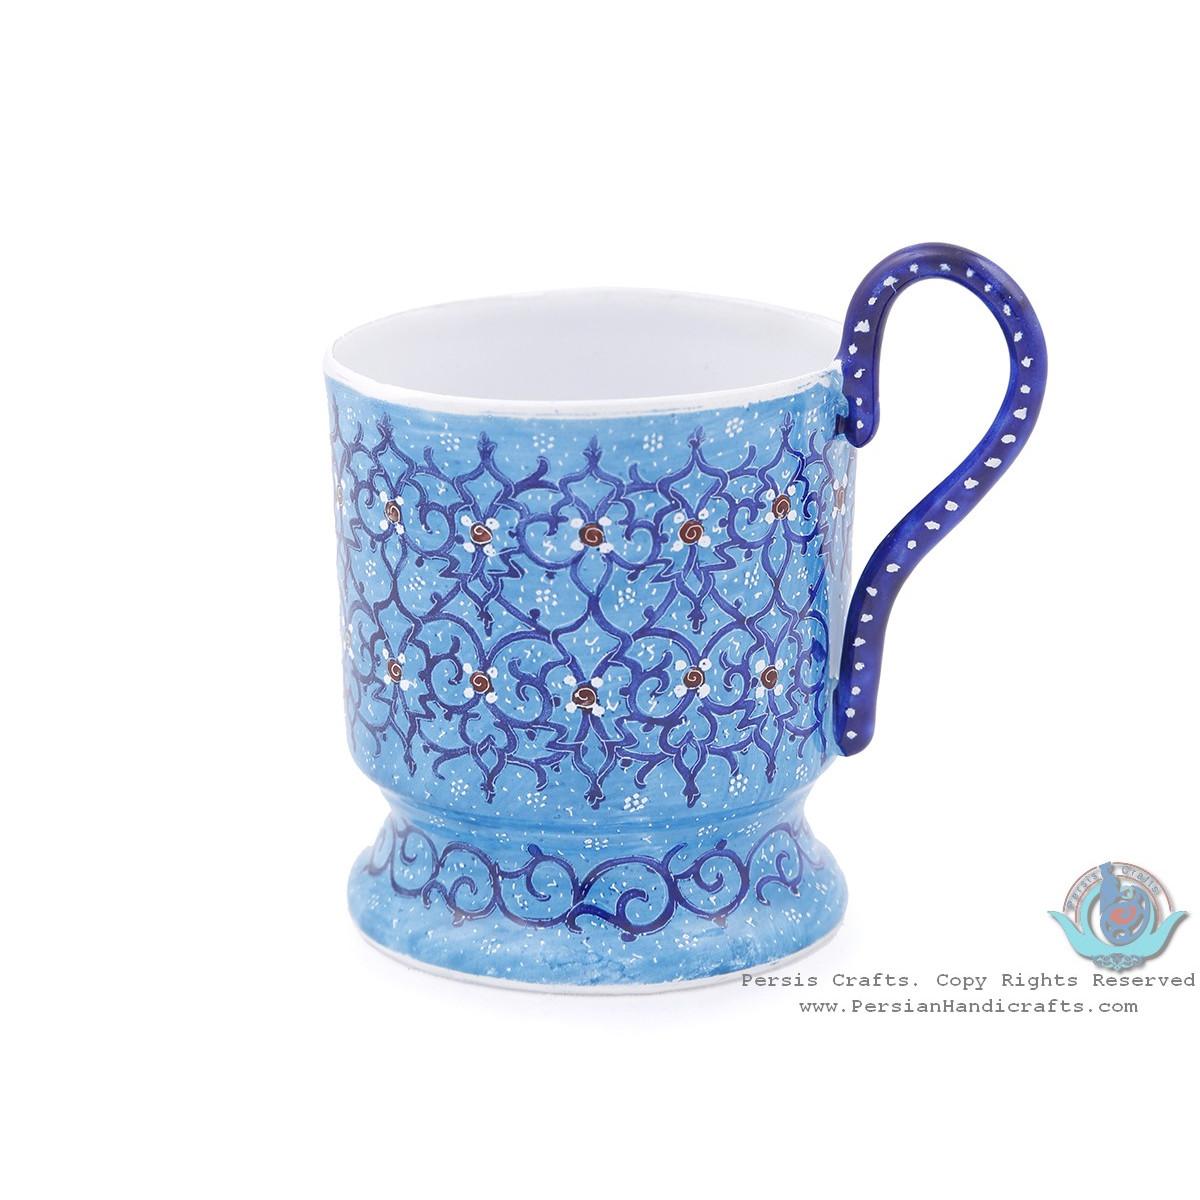 Enamel (Minakari) Tea Cup & Saucer - HE3804-Persian Handicrafts